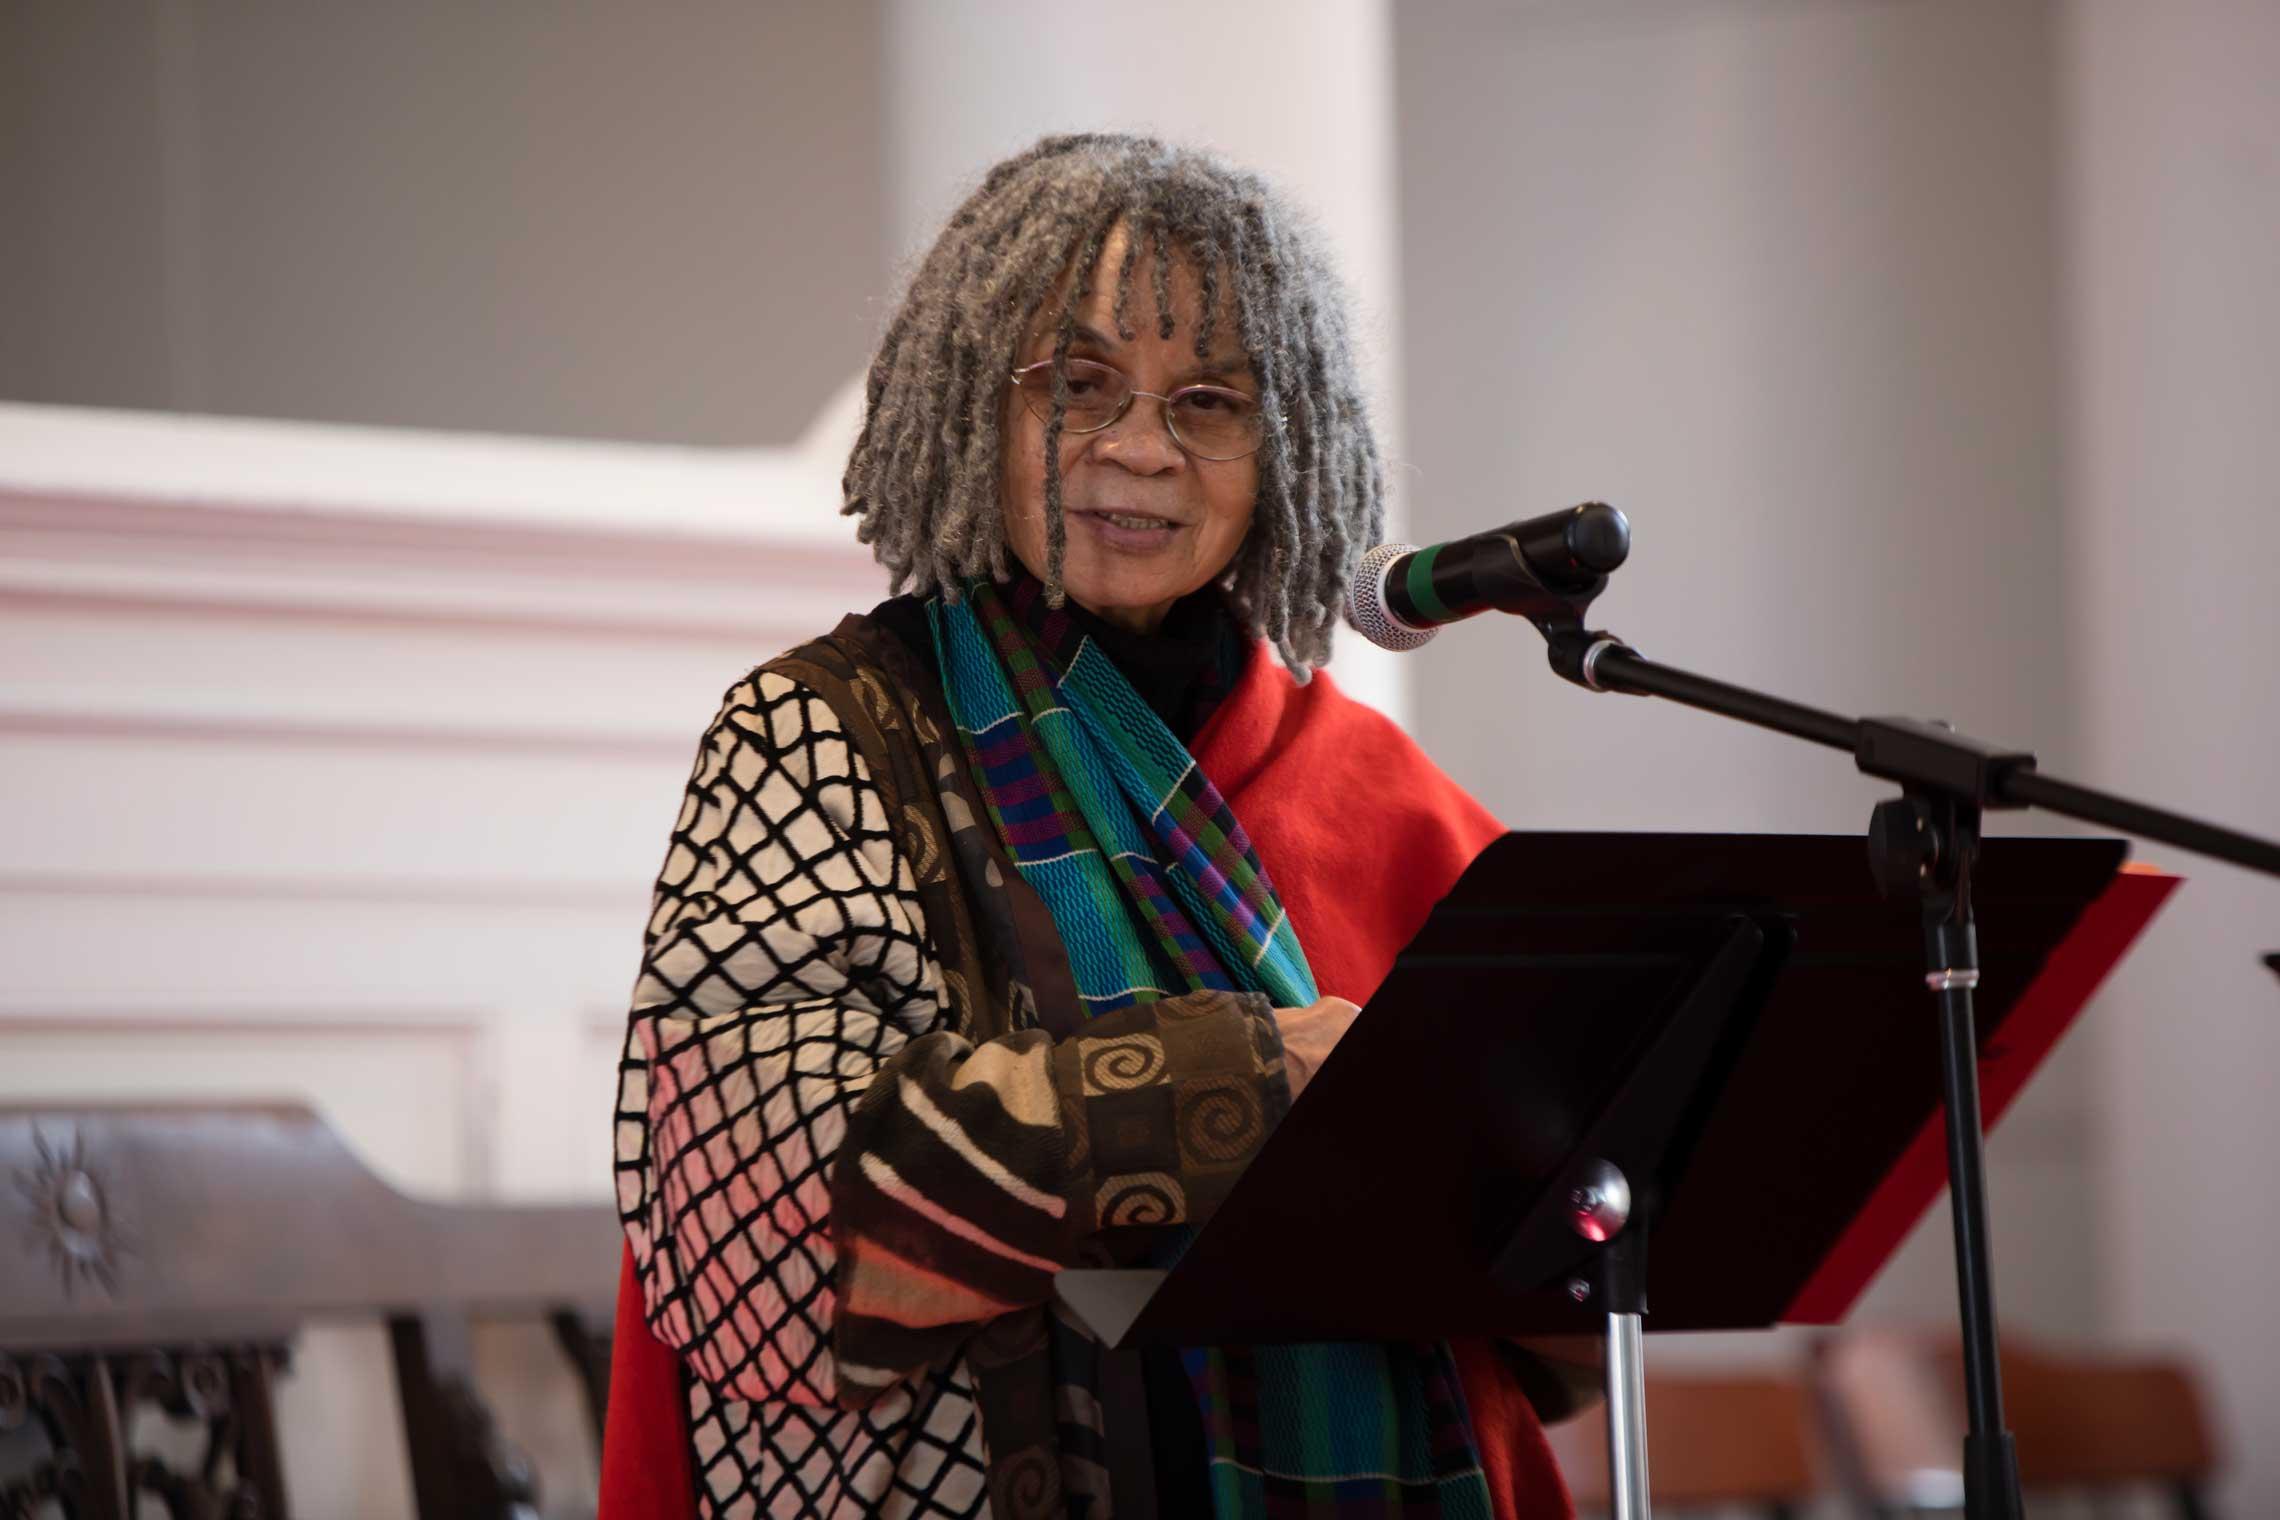 Poet and activist Sonia Sanchez speaking in Johnson Chapel